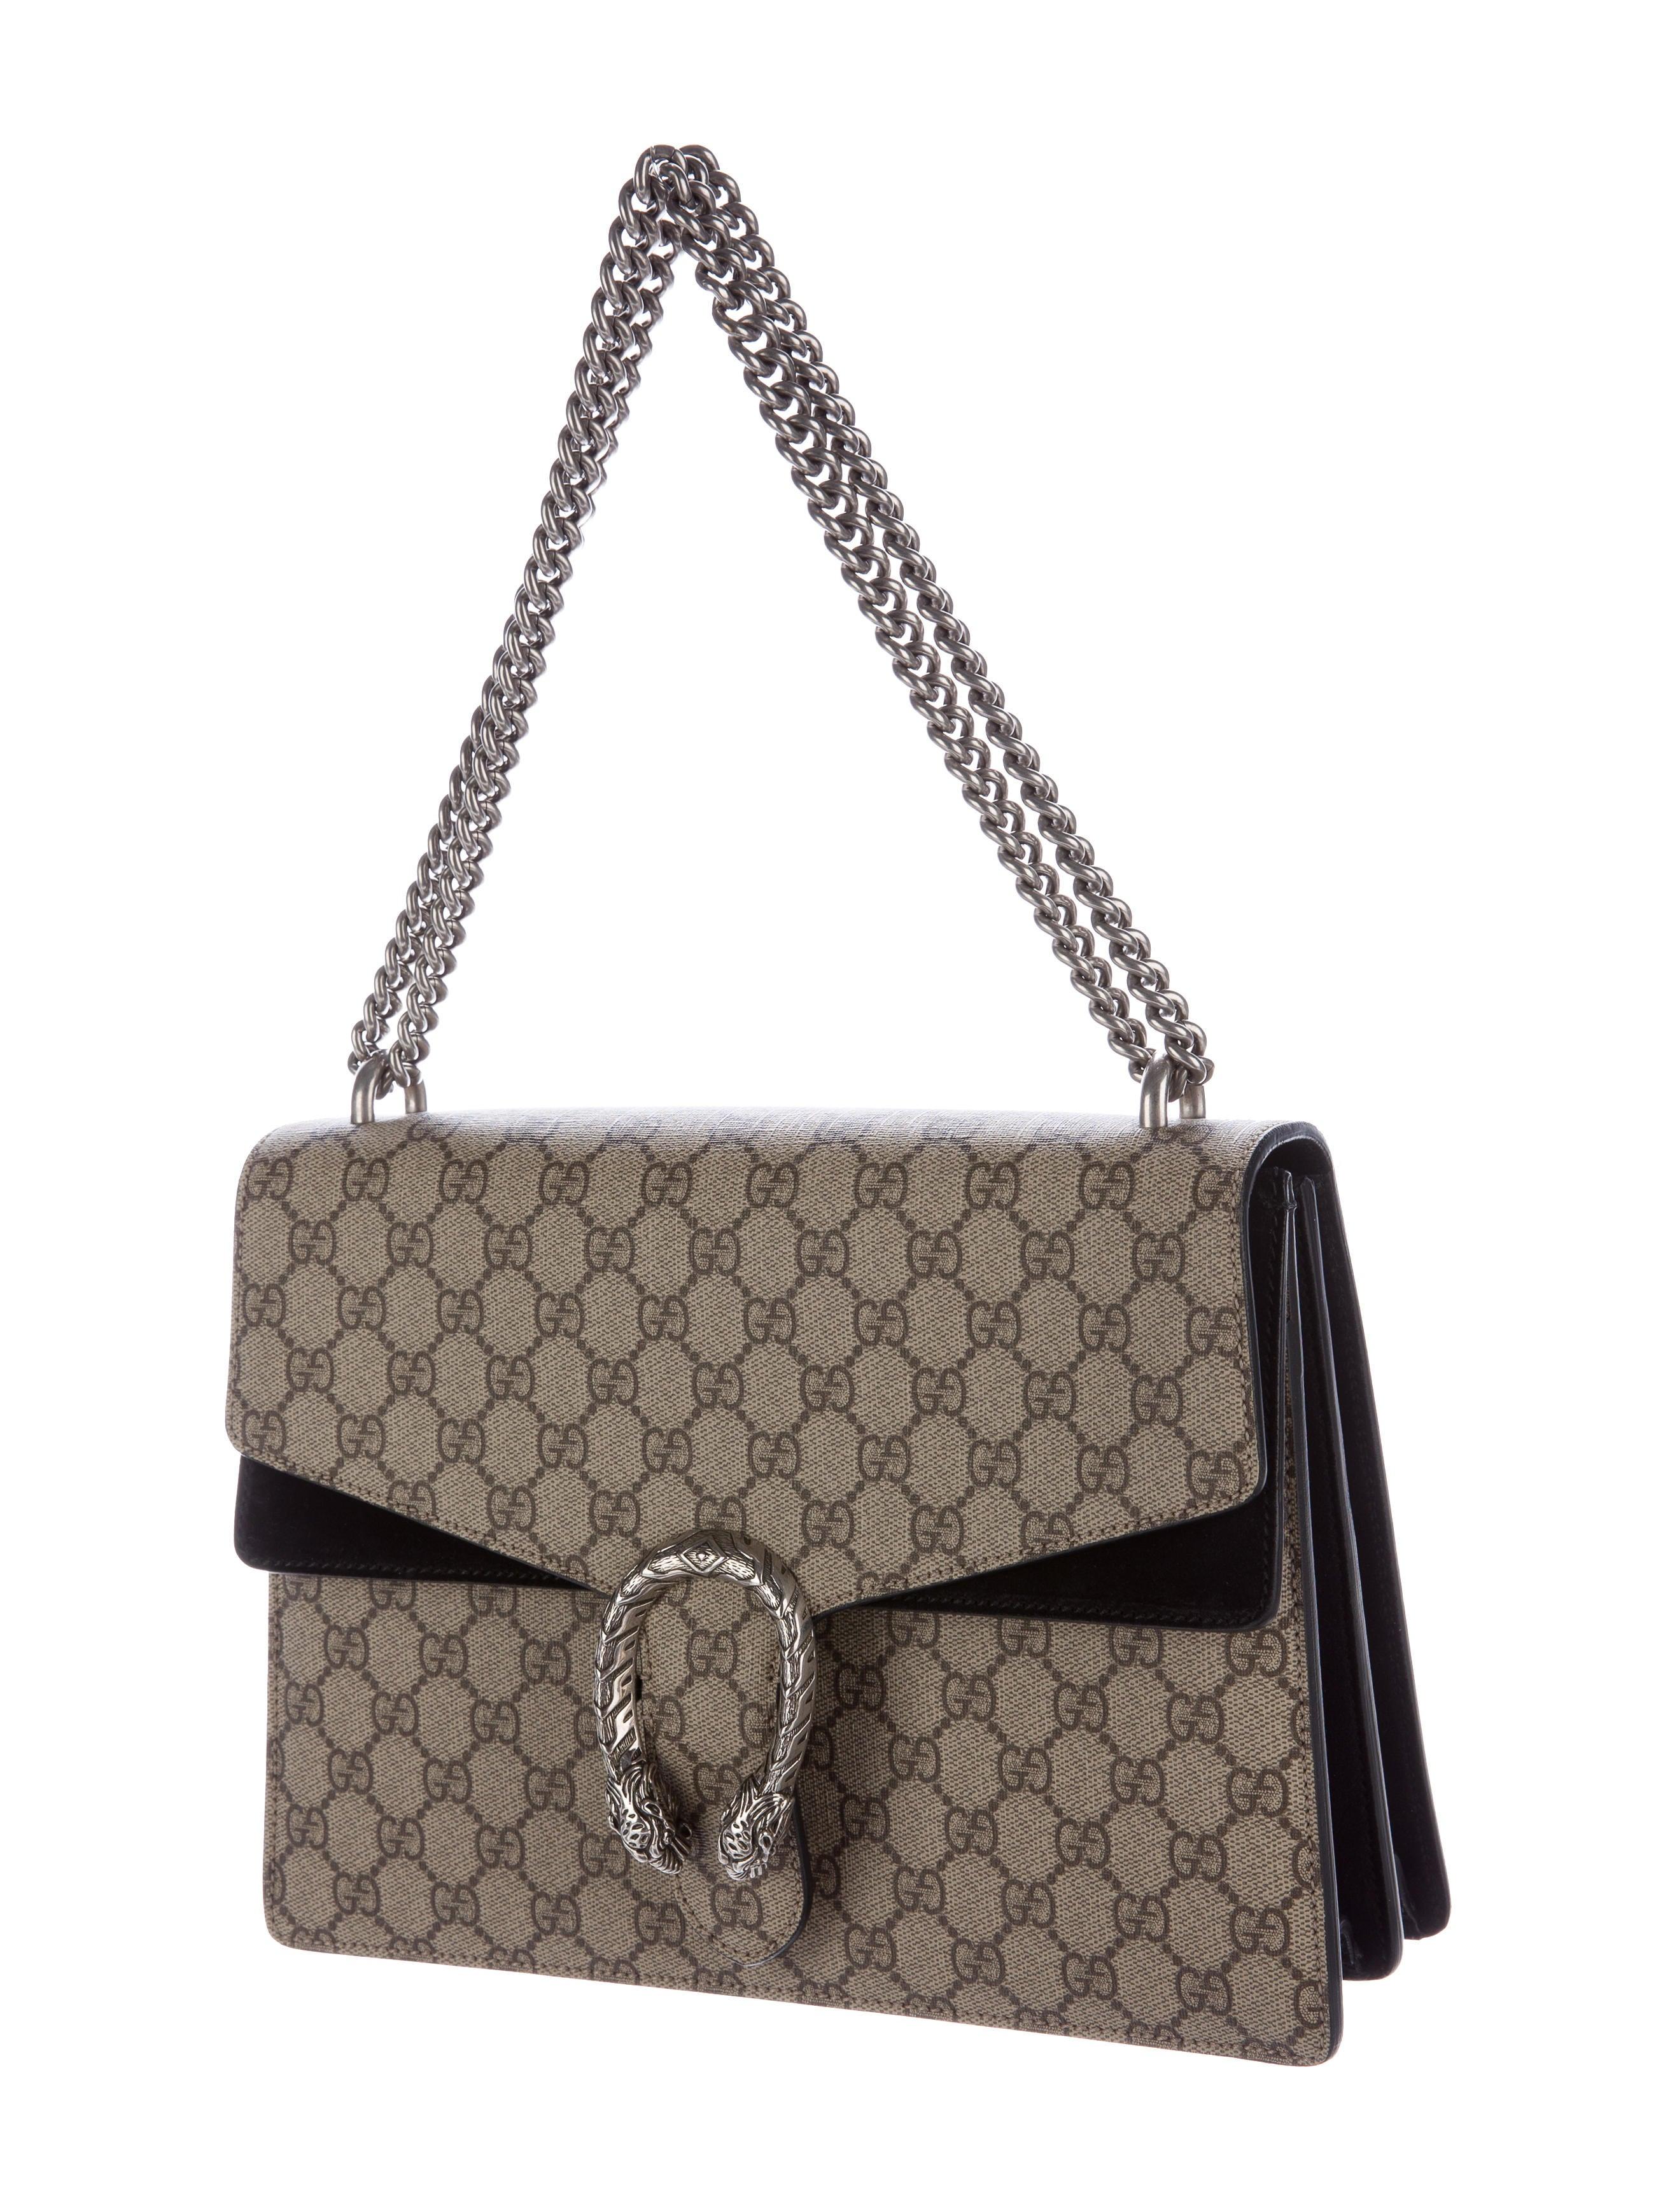 bd6eebc41b77 Gucci Gg Supreme Medium Shoulder Bag 523354 Dark Coffee | Stanford ...